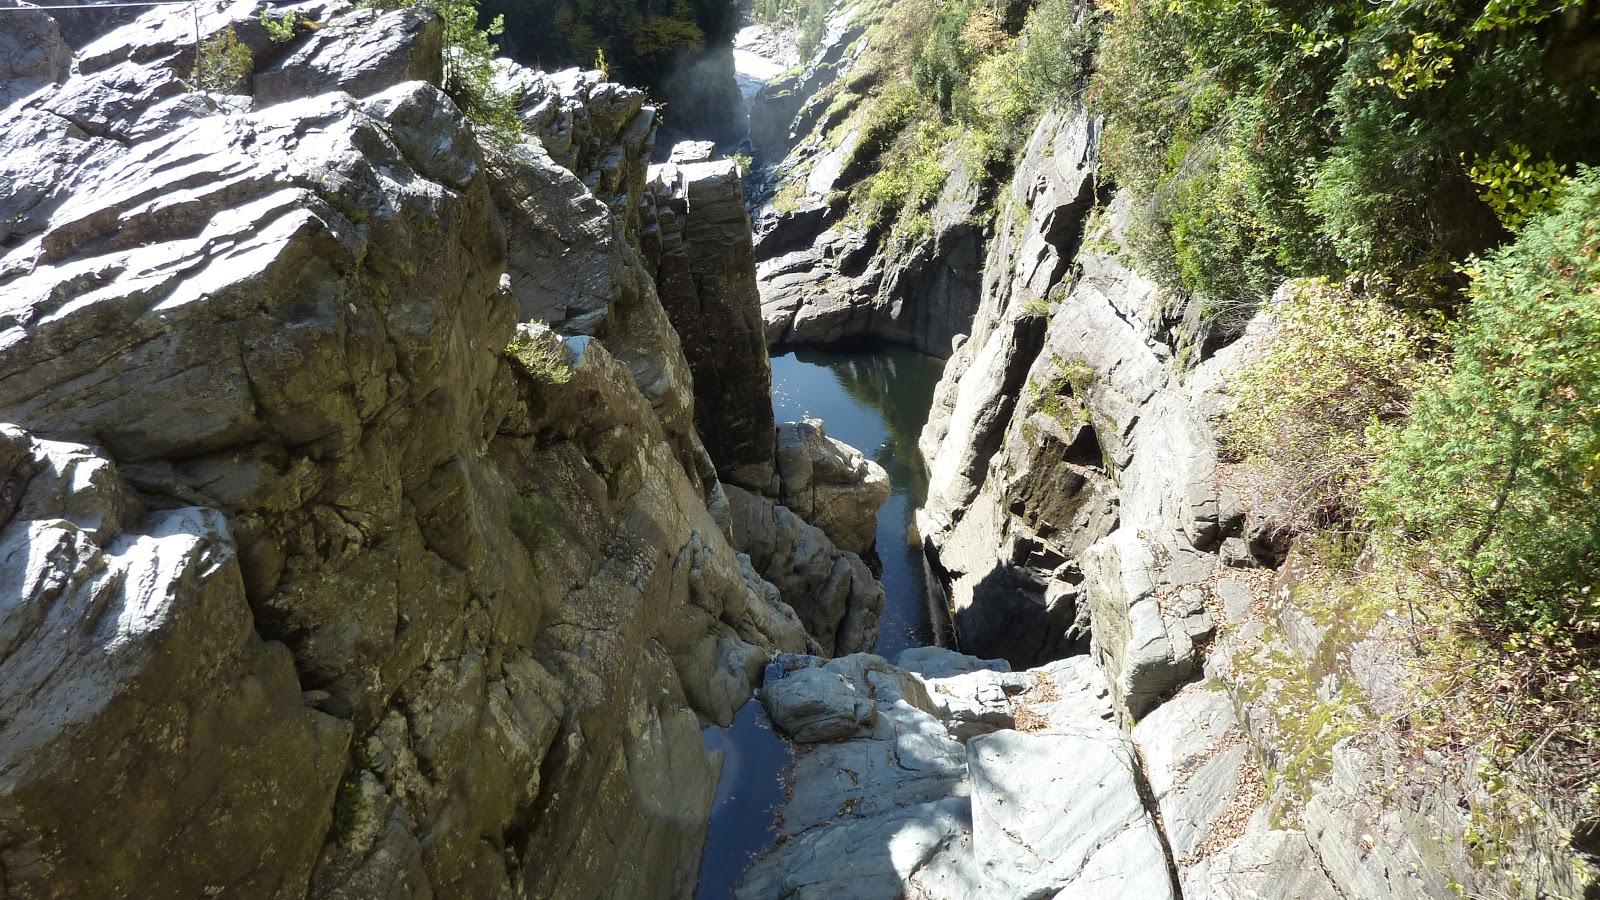 Klettergurt Fibel : Alpen club ac: klettern im canyon saint anne